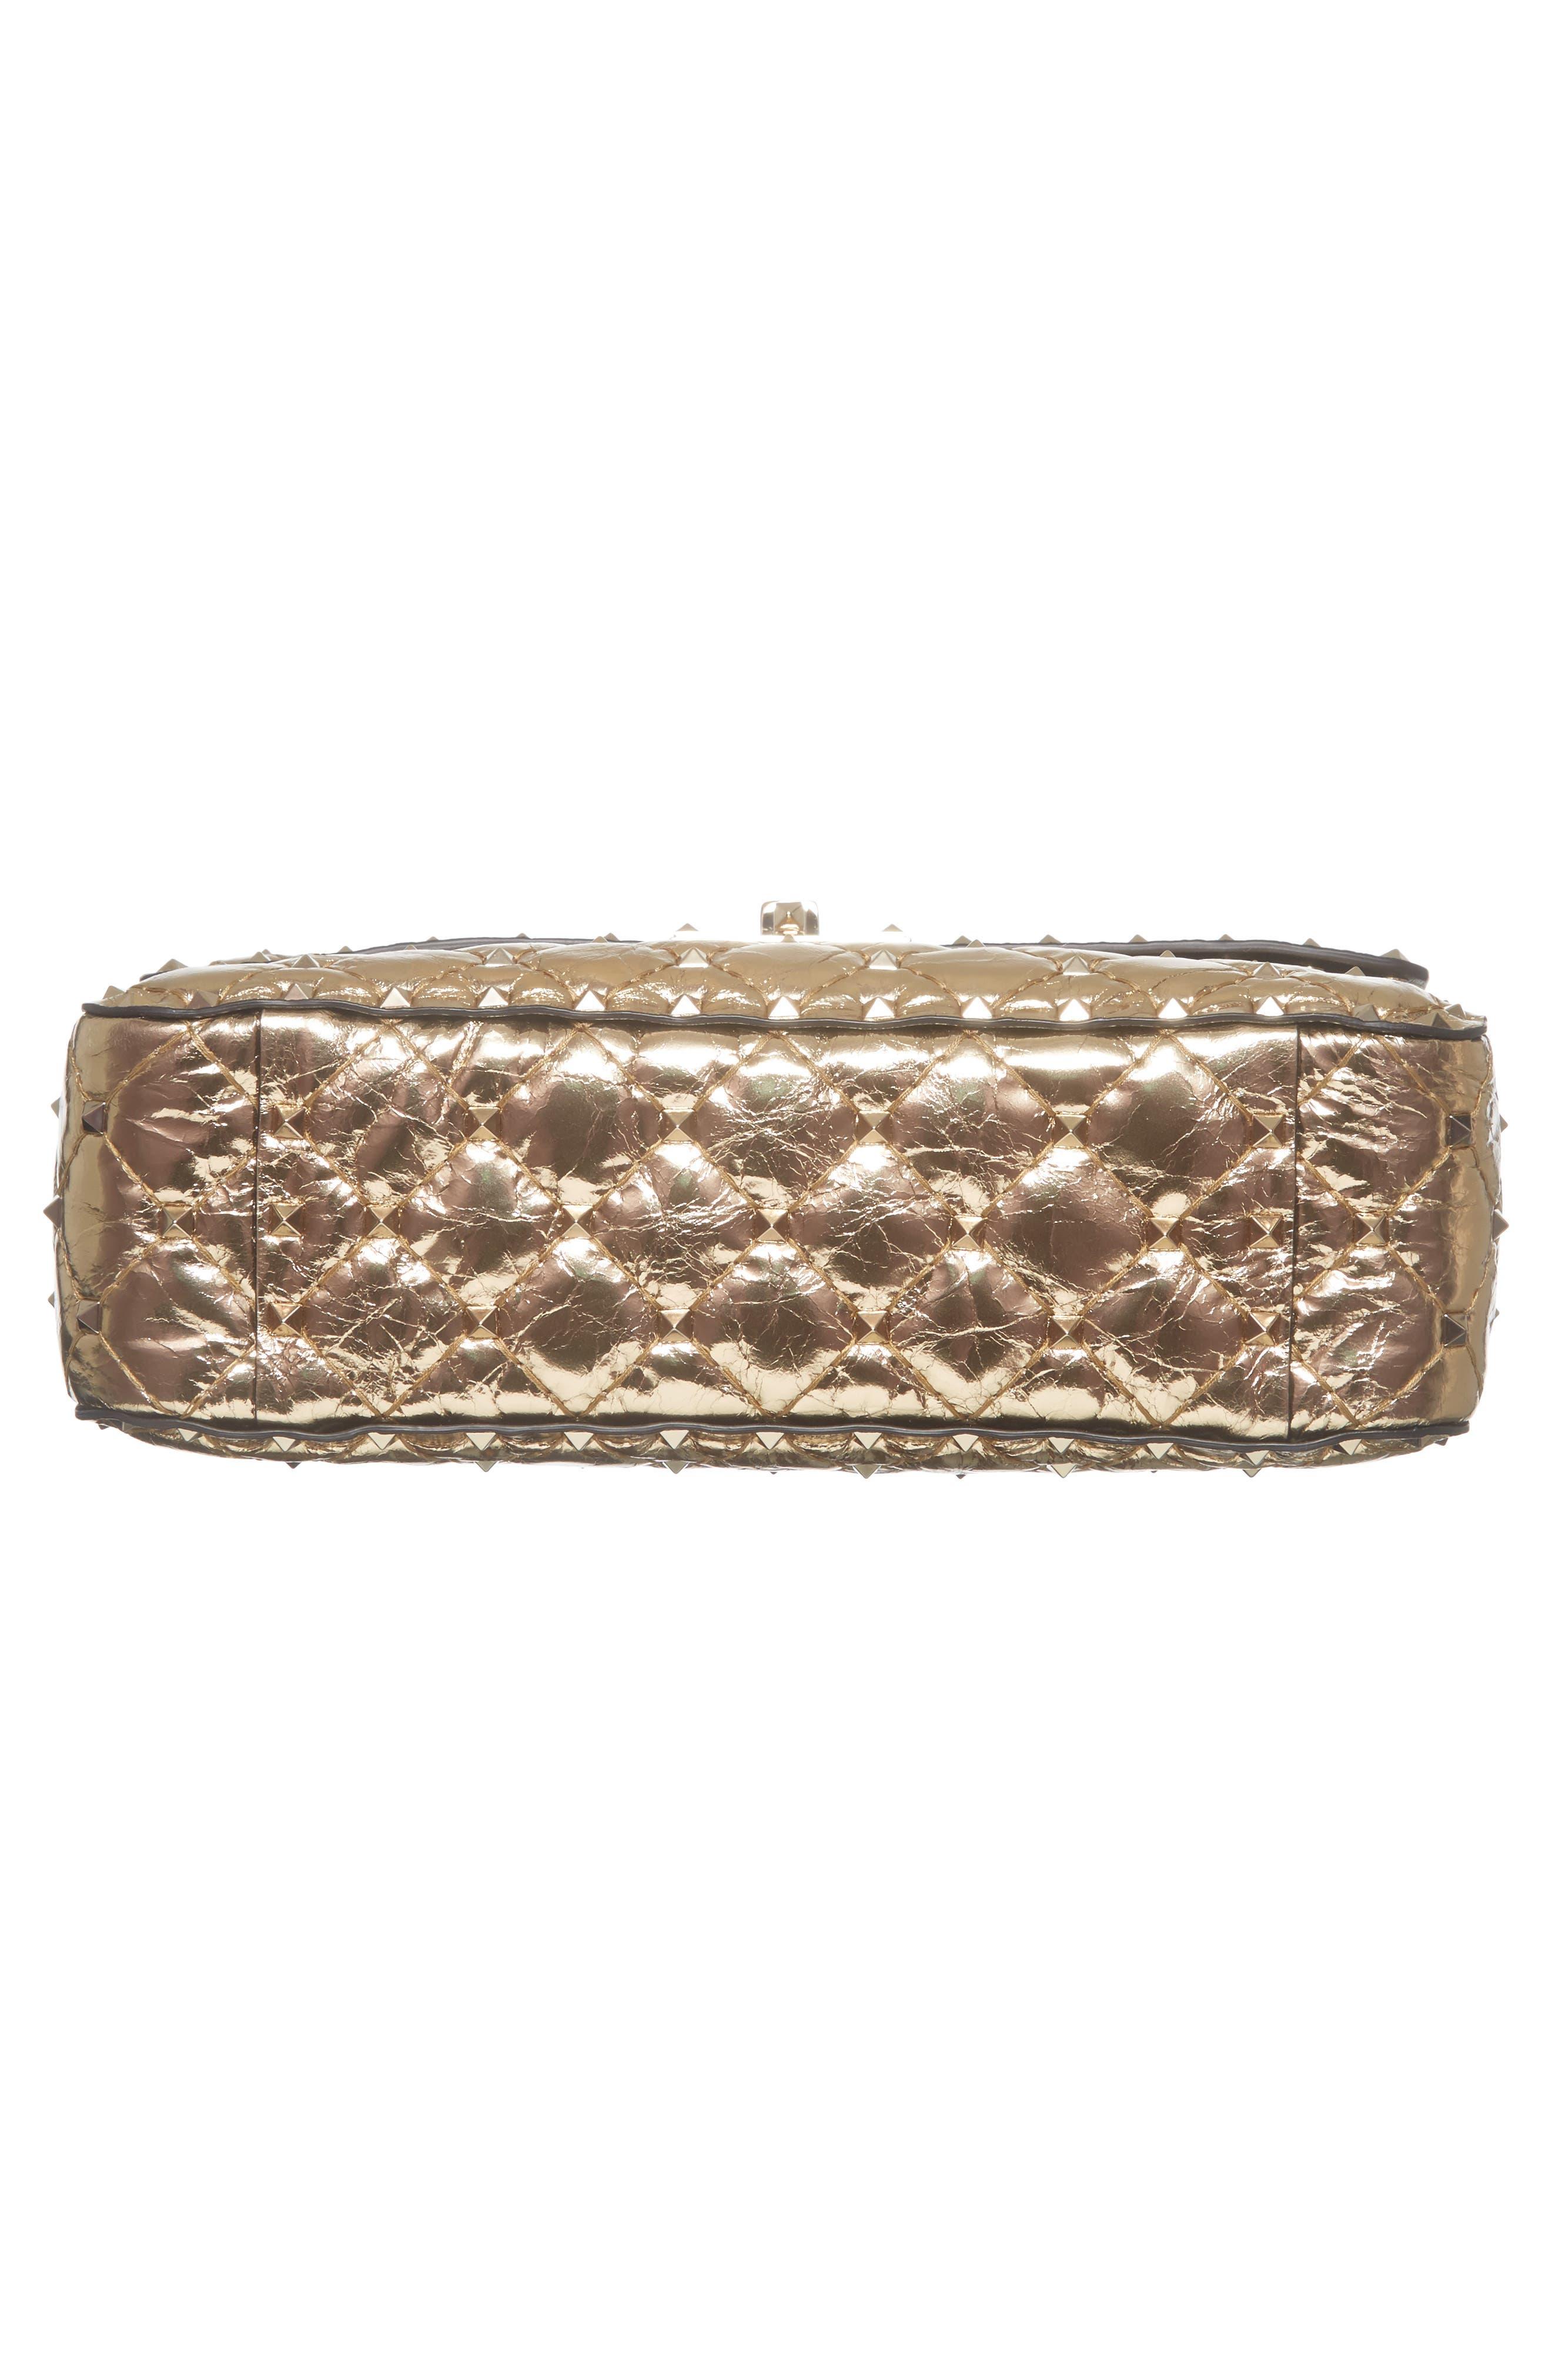 Matelassé Rockstud Spike Leather Top Handle Bag,                             Alternate thumbnail 5, color,                             Mekong